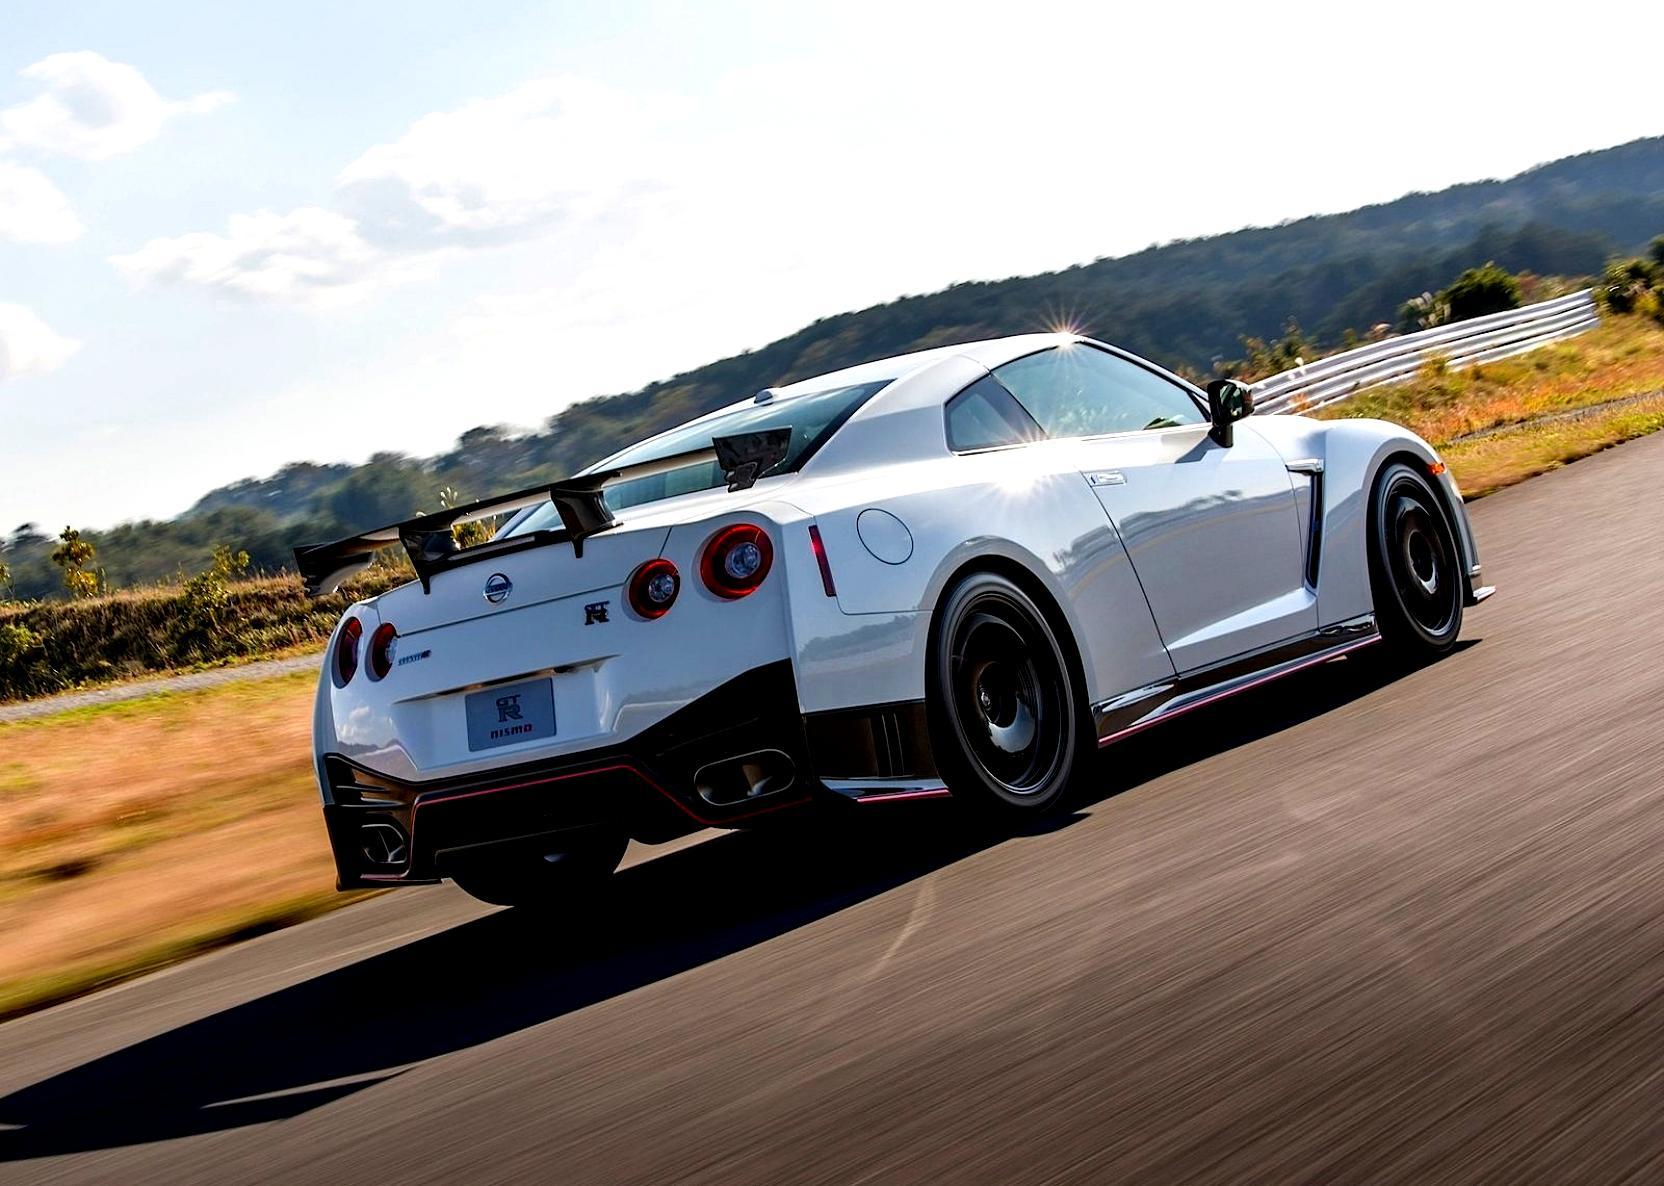 Nissan Juke Tire Size >> Nissan GT-R R35 Nismo 2014 on MotoImg.com